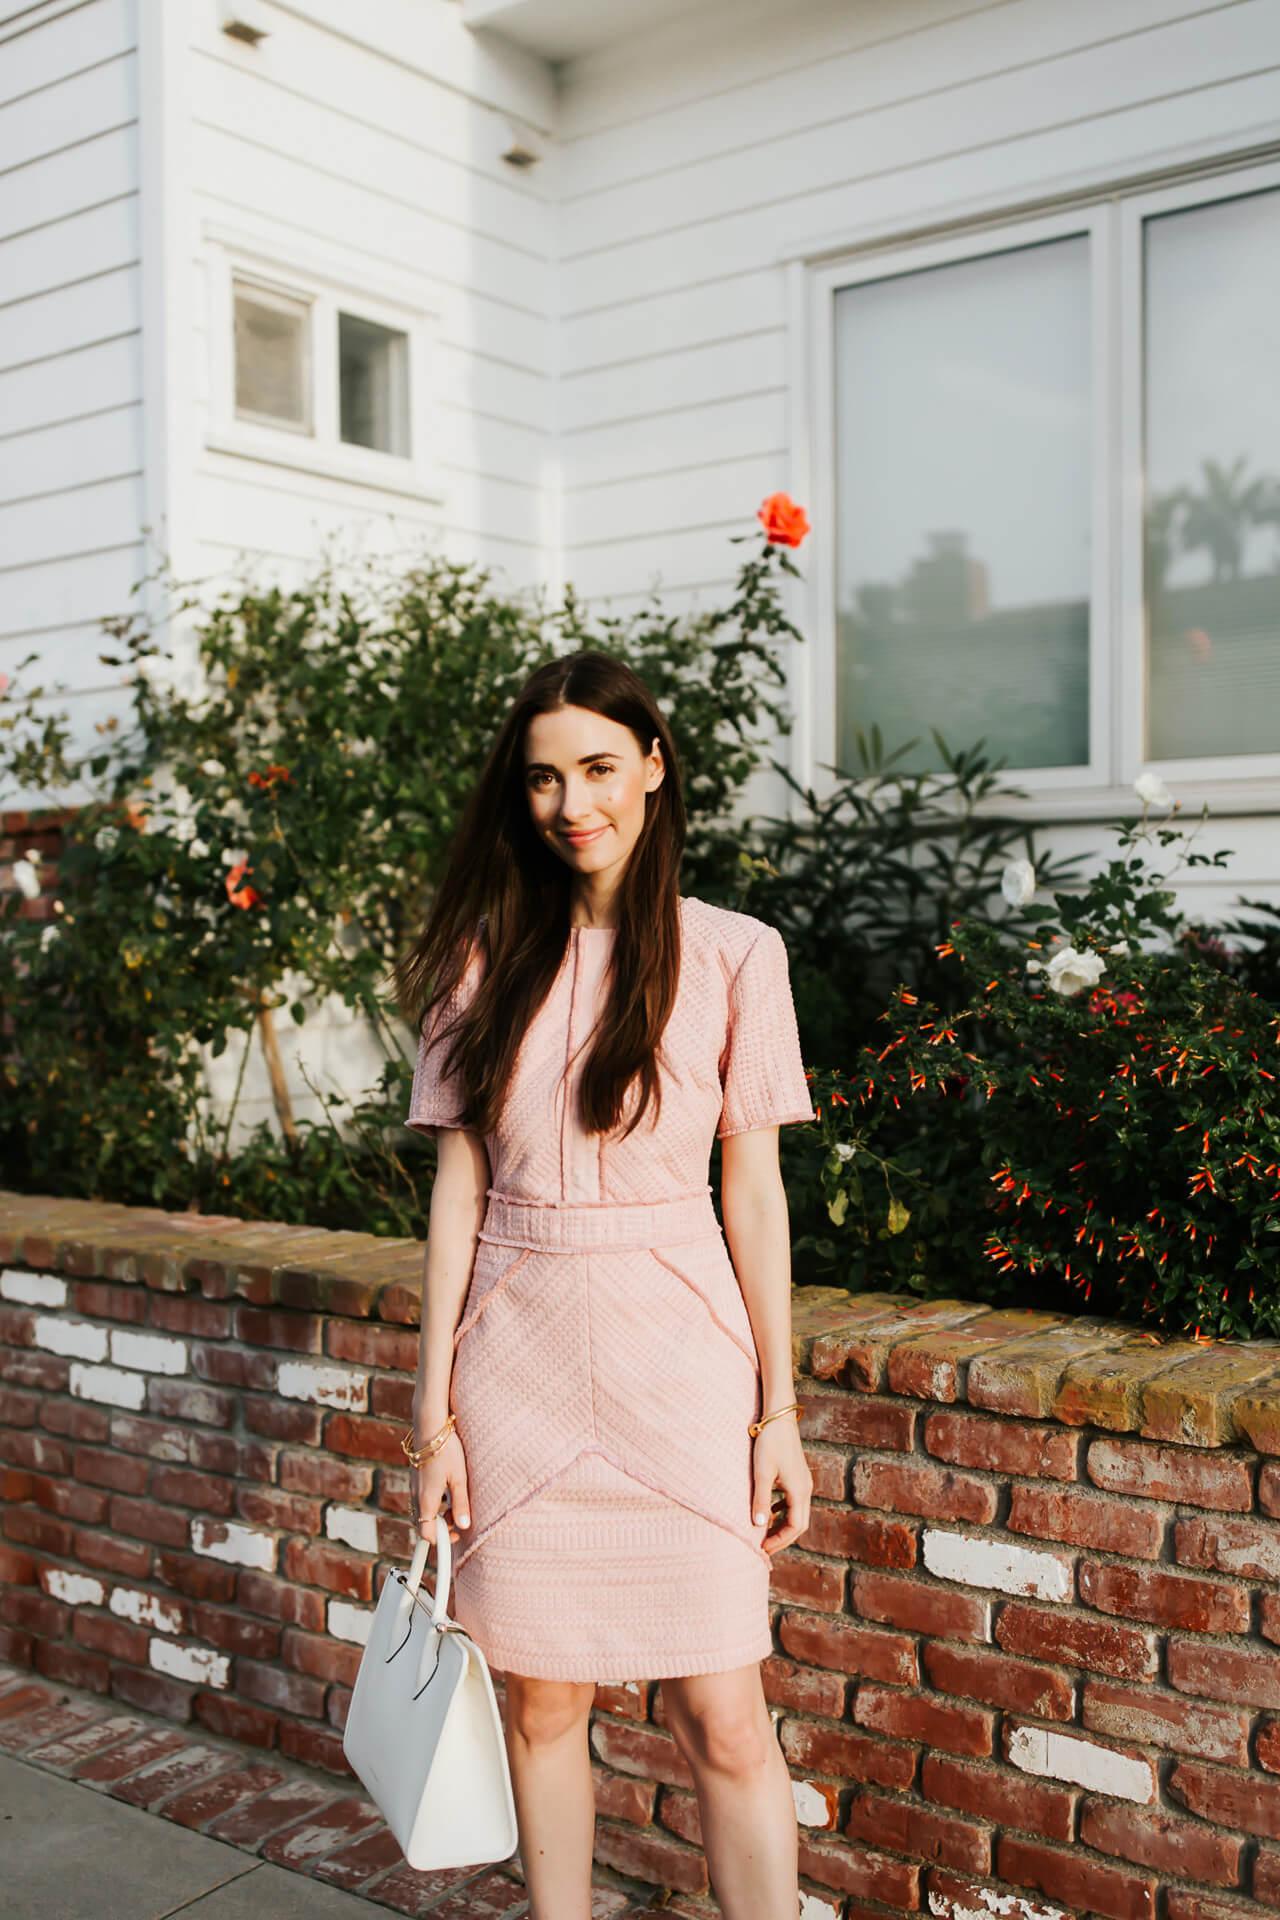 Chanel-Inspired Dresses That Won't Break The Bank